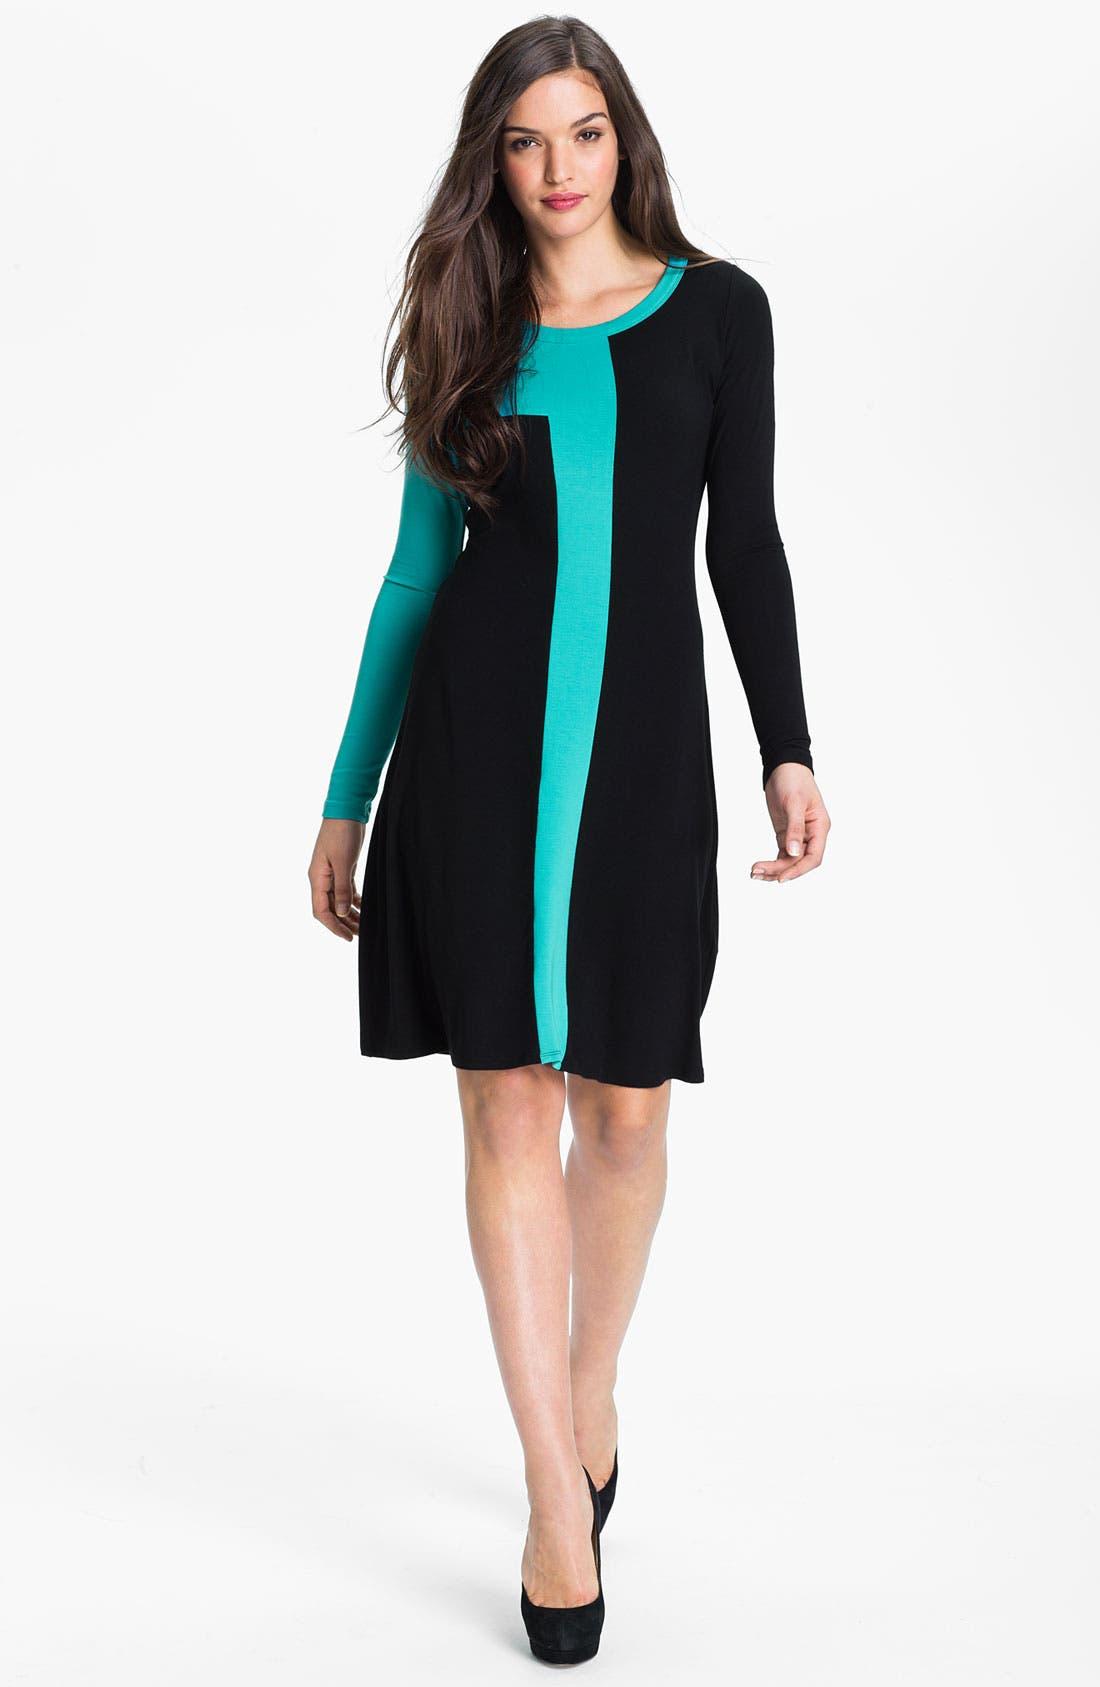 Alternate Image 1 Selected - Karen Kane Colorblock Dress